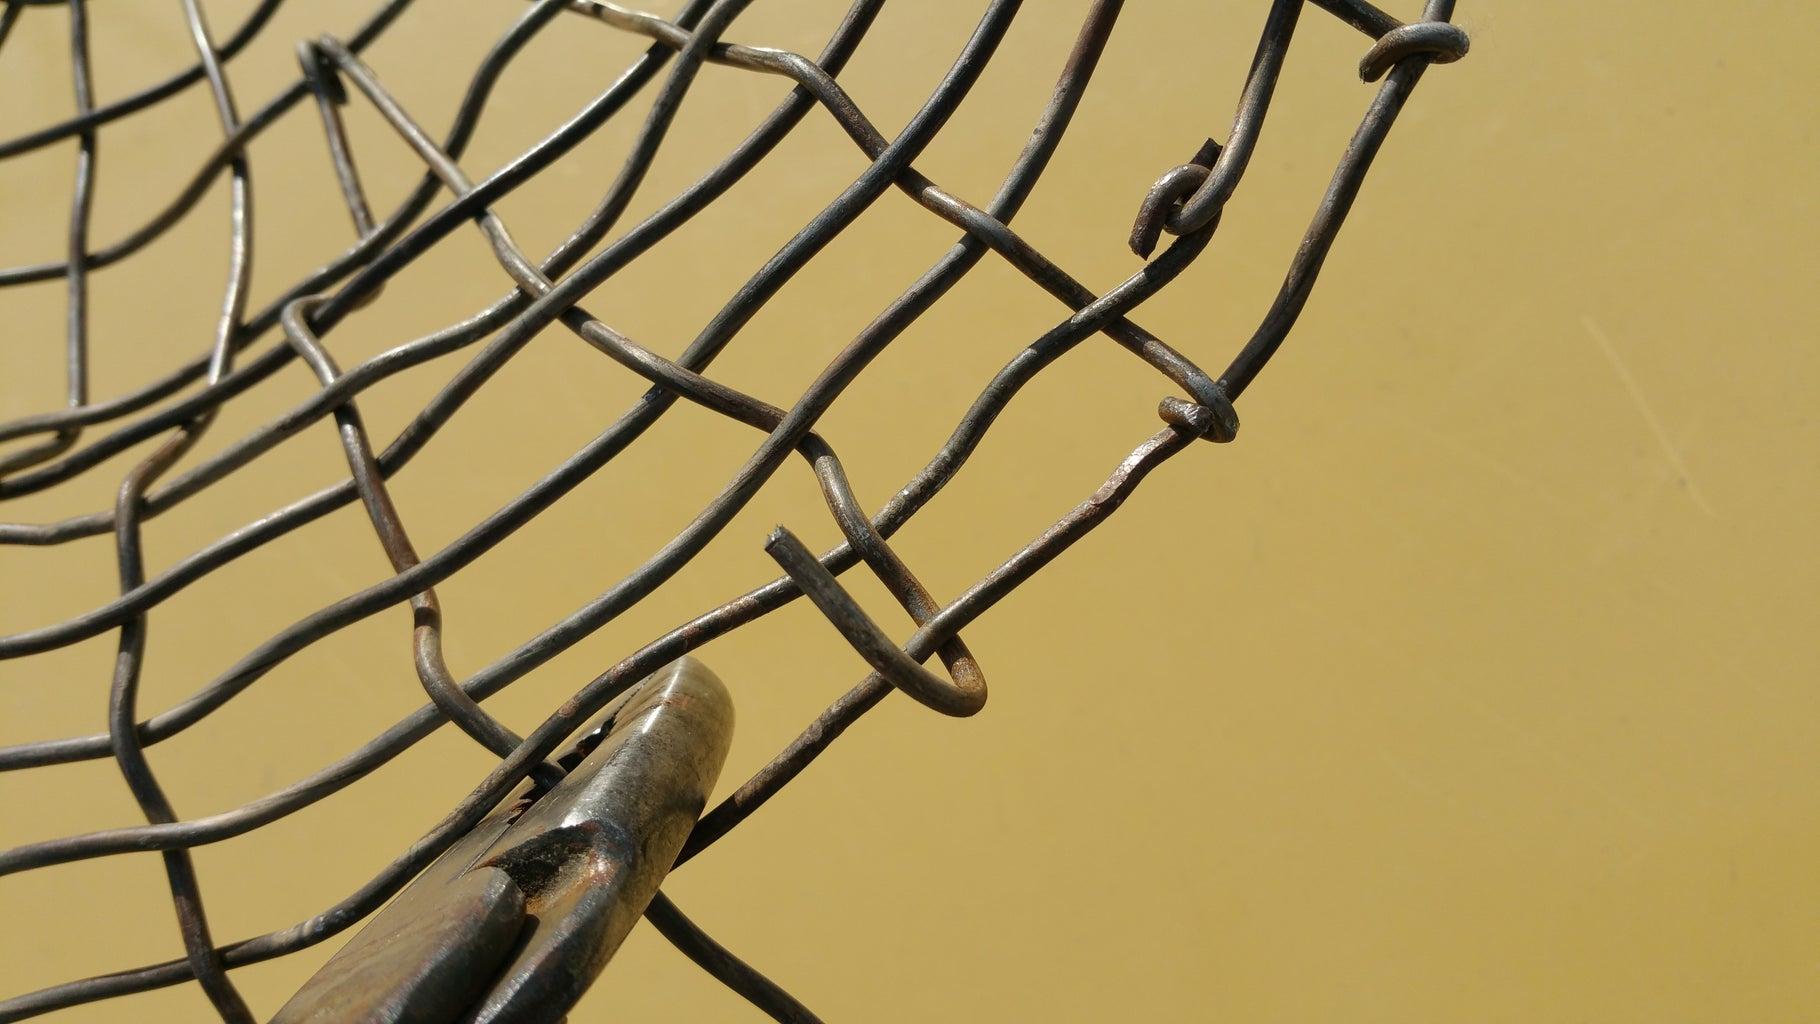 Weaving the Rim of the Harvest Basket